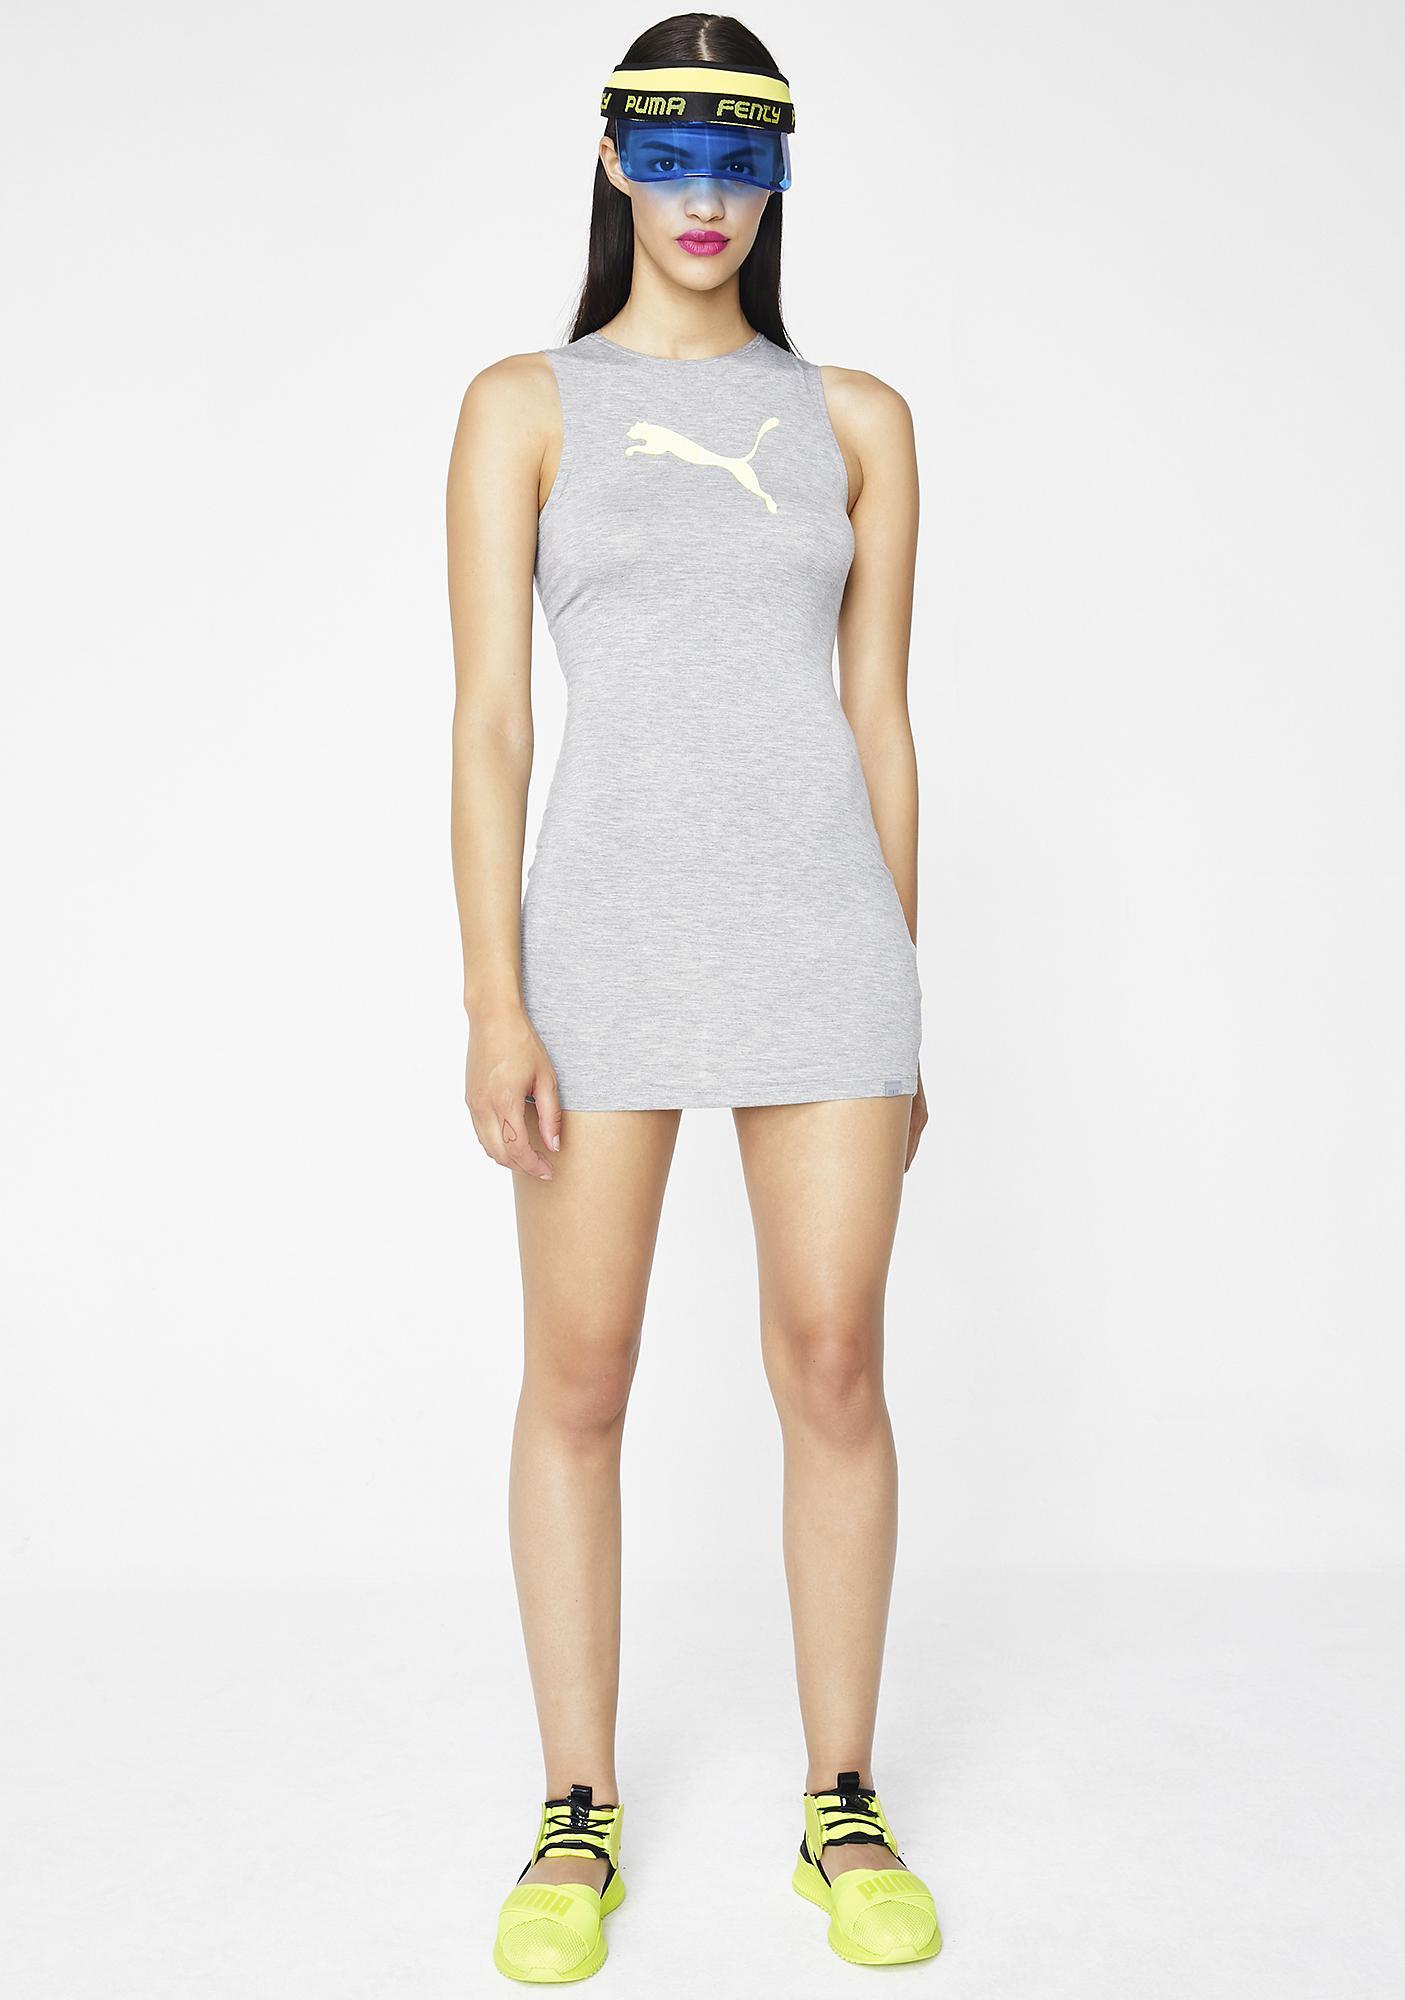 PUMA FENTY PUMA By Rihanna Full Zip Jersey Cover Up Dress